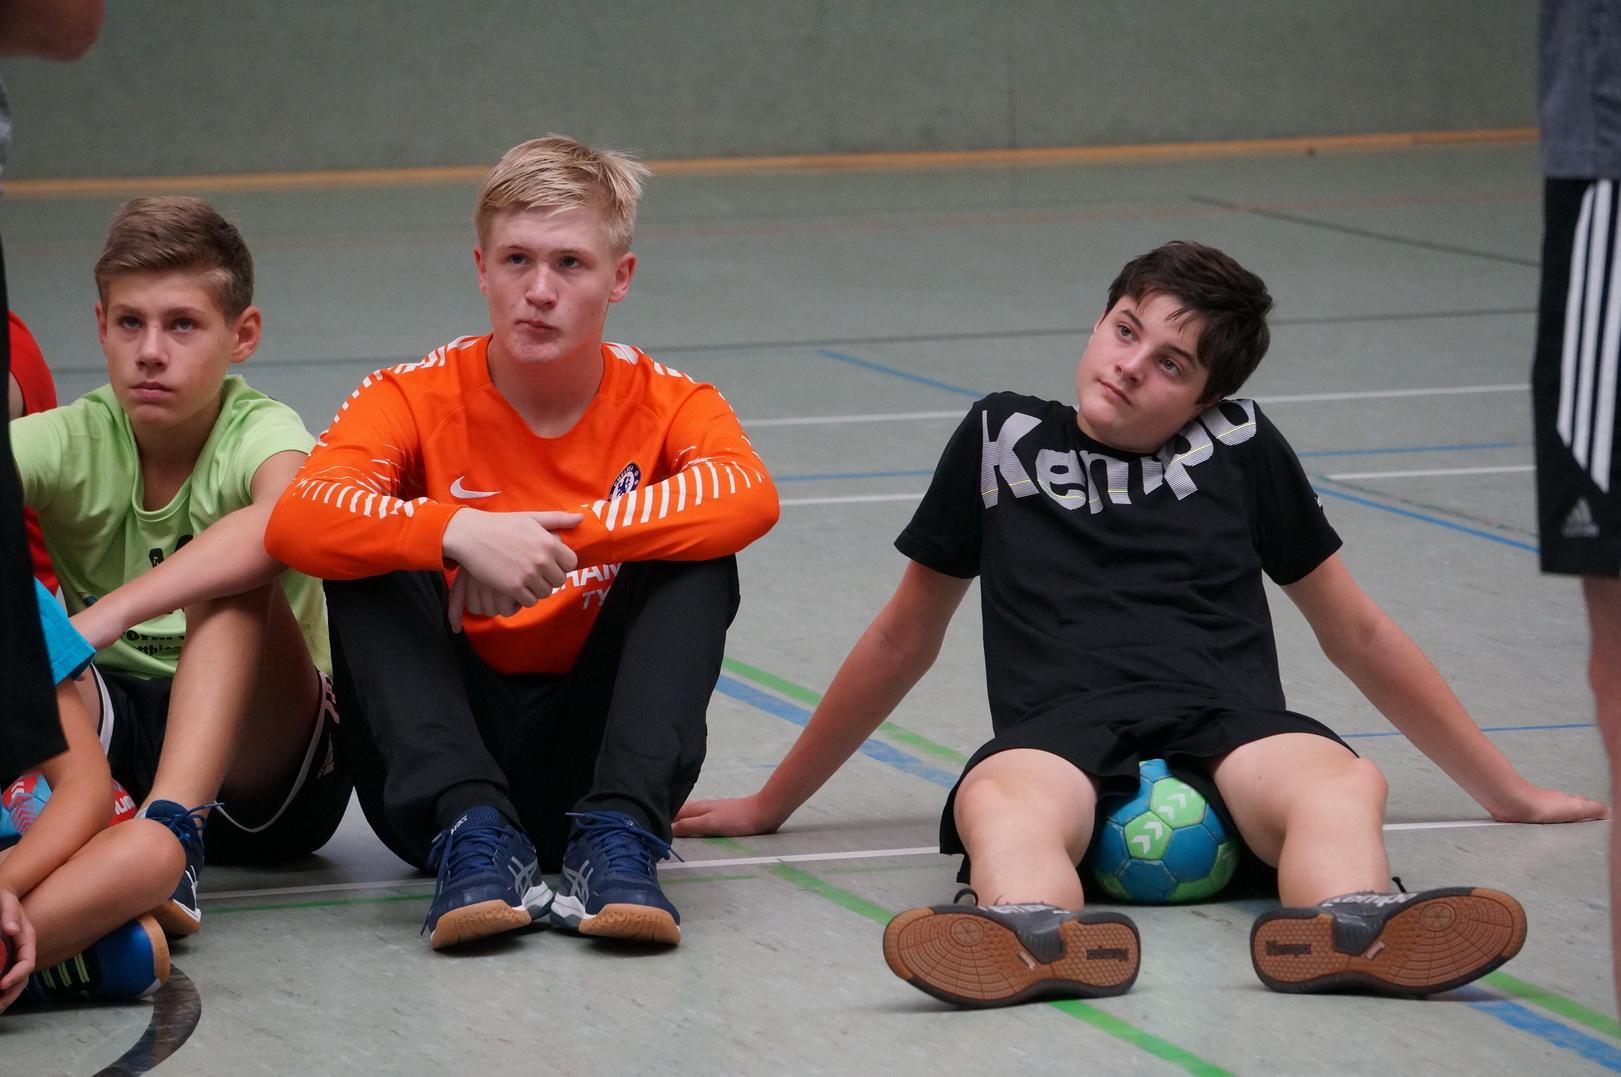 201808_Handballcamp_SDH_MG_019w